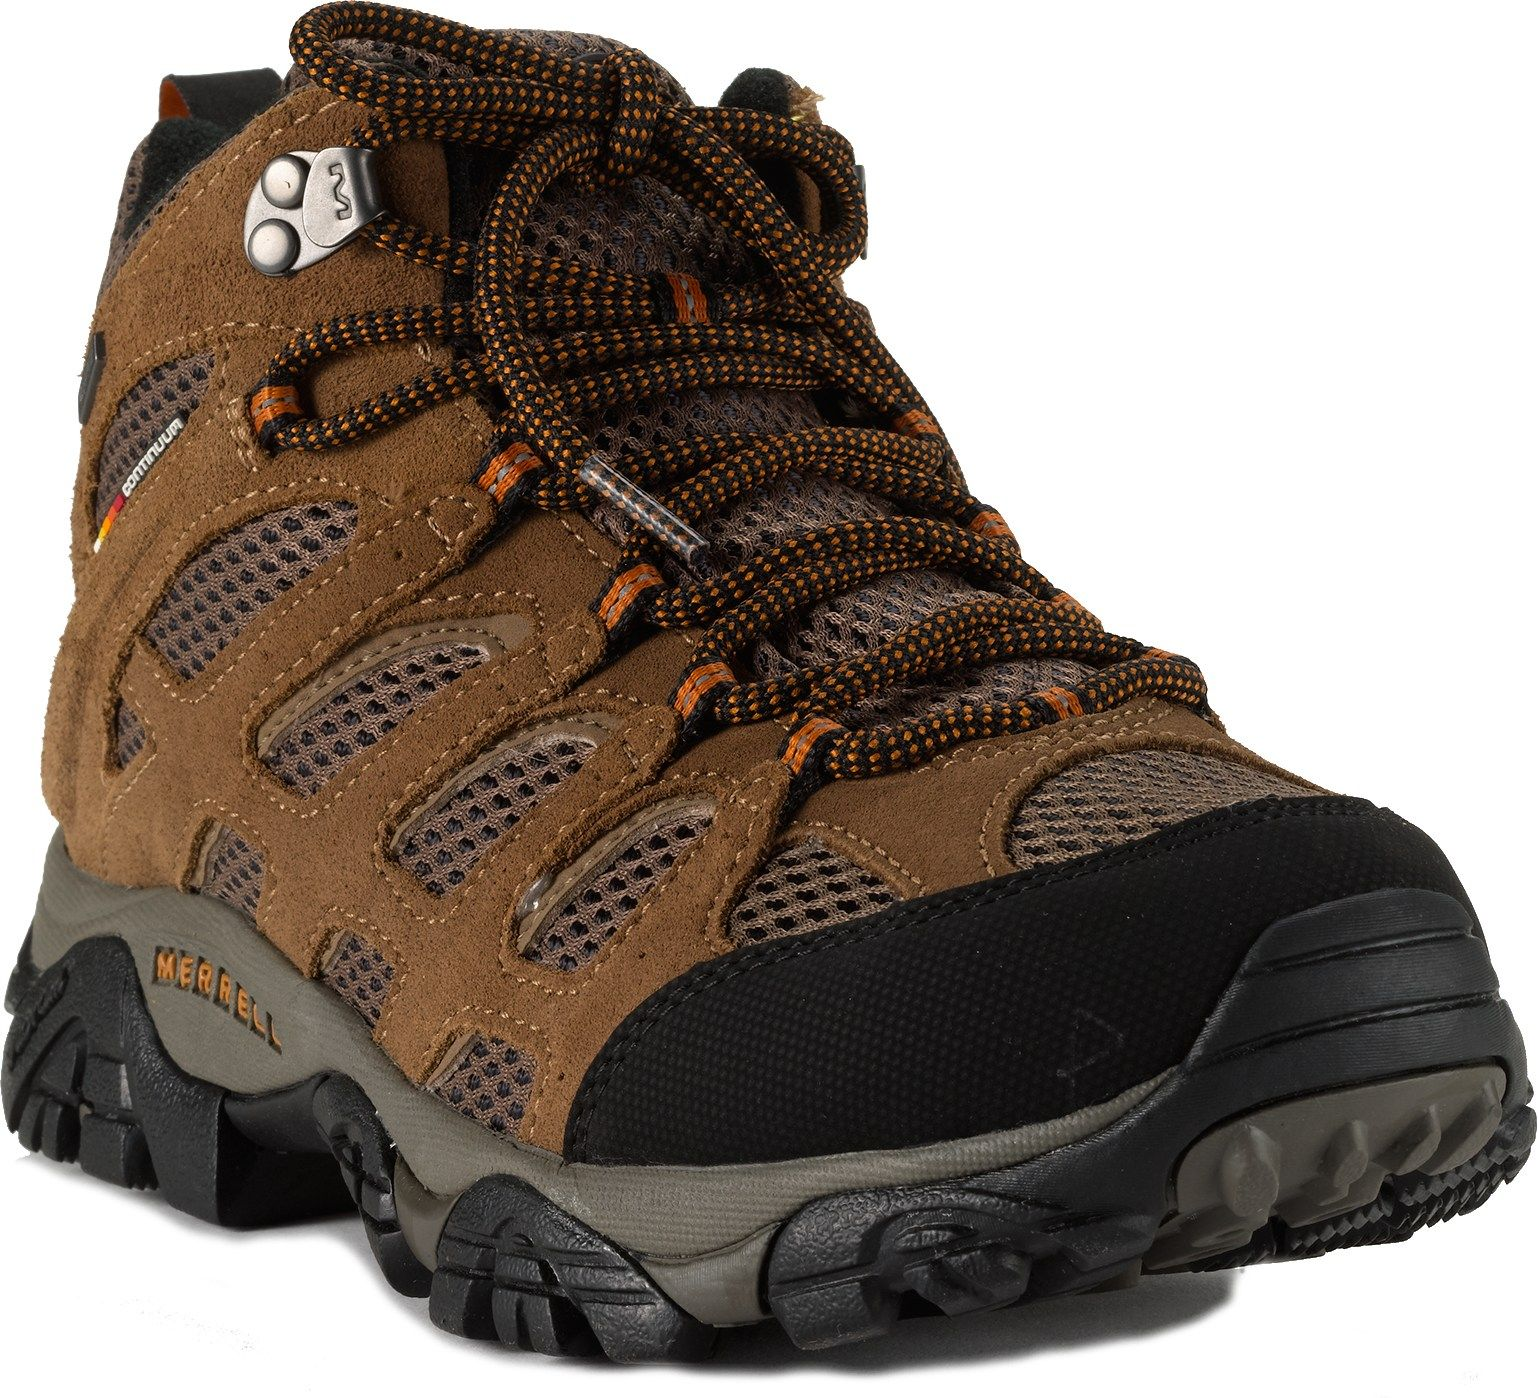 Merrell Men's Moab Mid Waterproof Hiking Boots Earth 13 ...